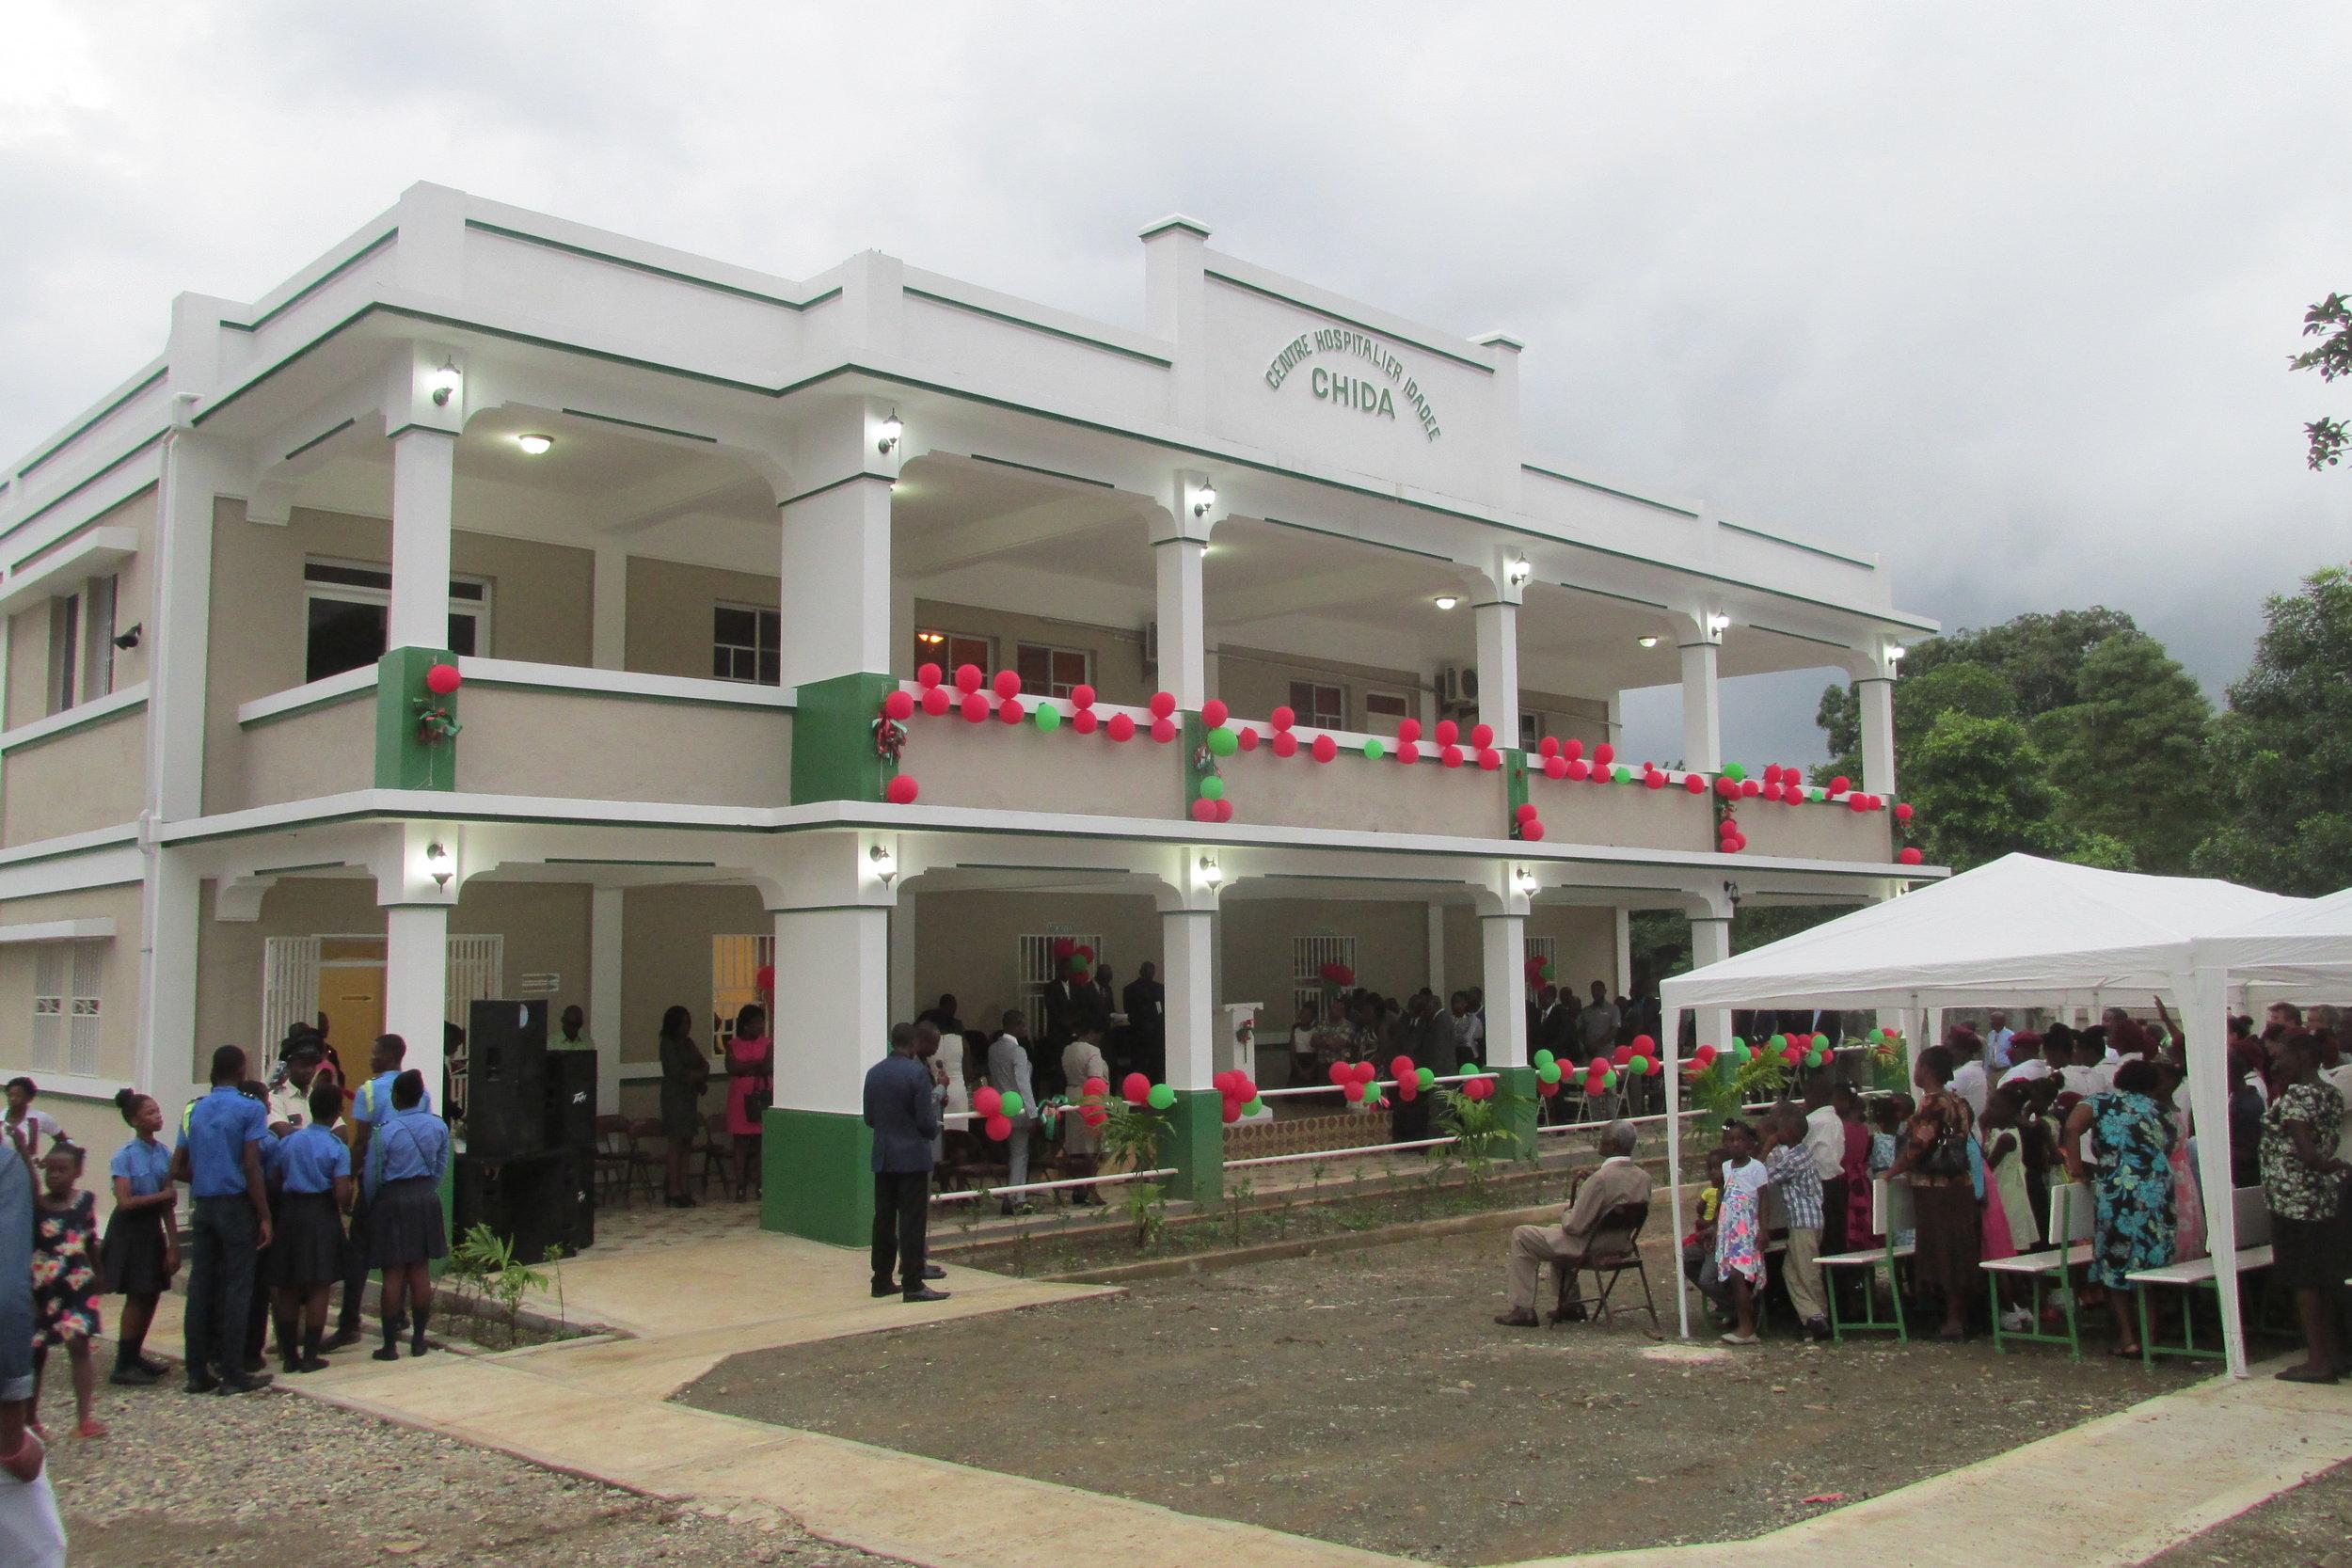 Dedication Day festivities at the newly opened CHIDA Hospital in Cap Haitien, Haiti